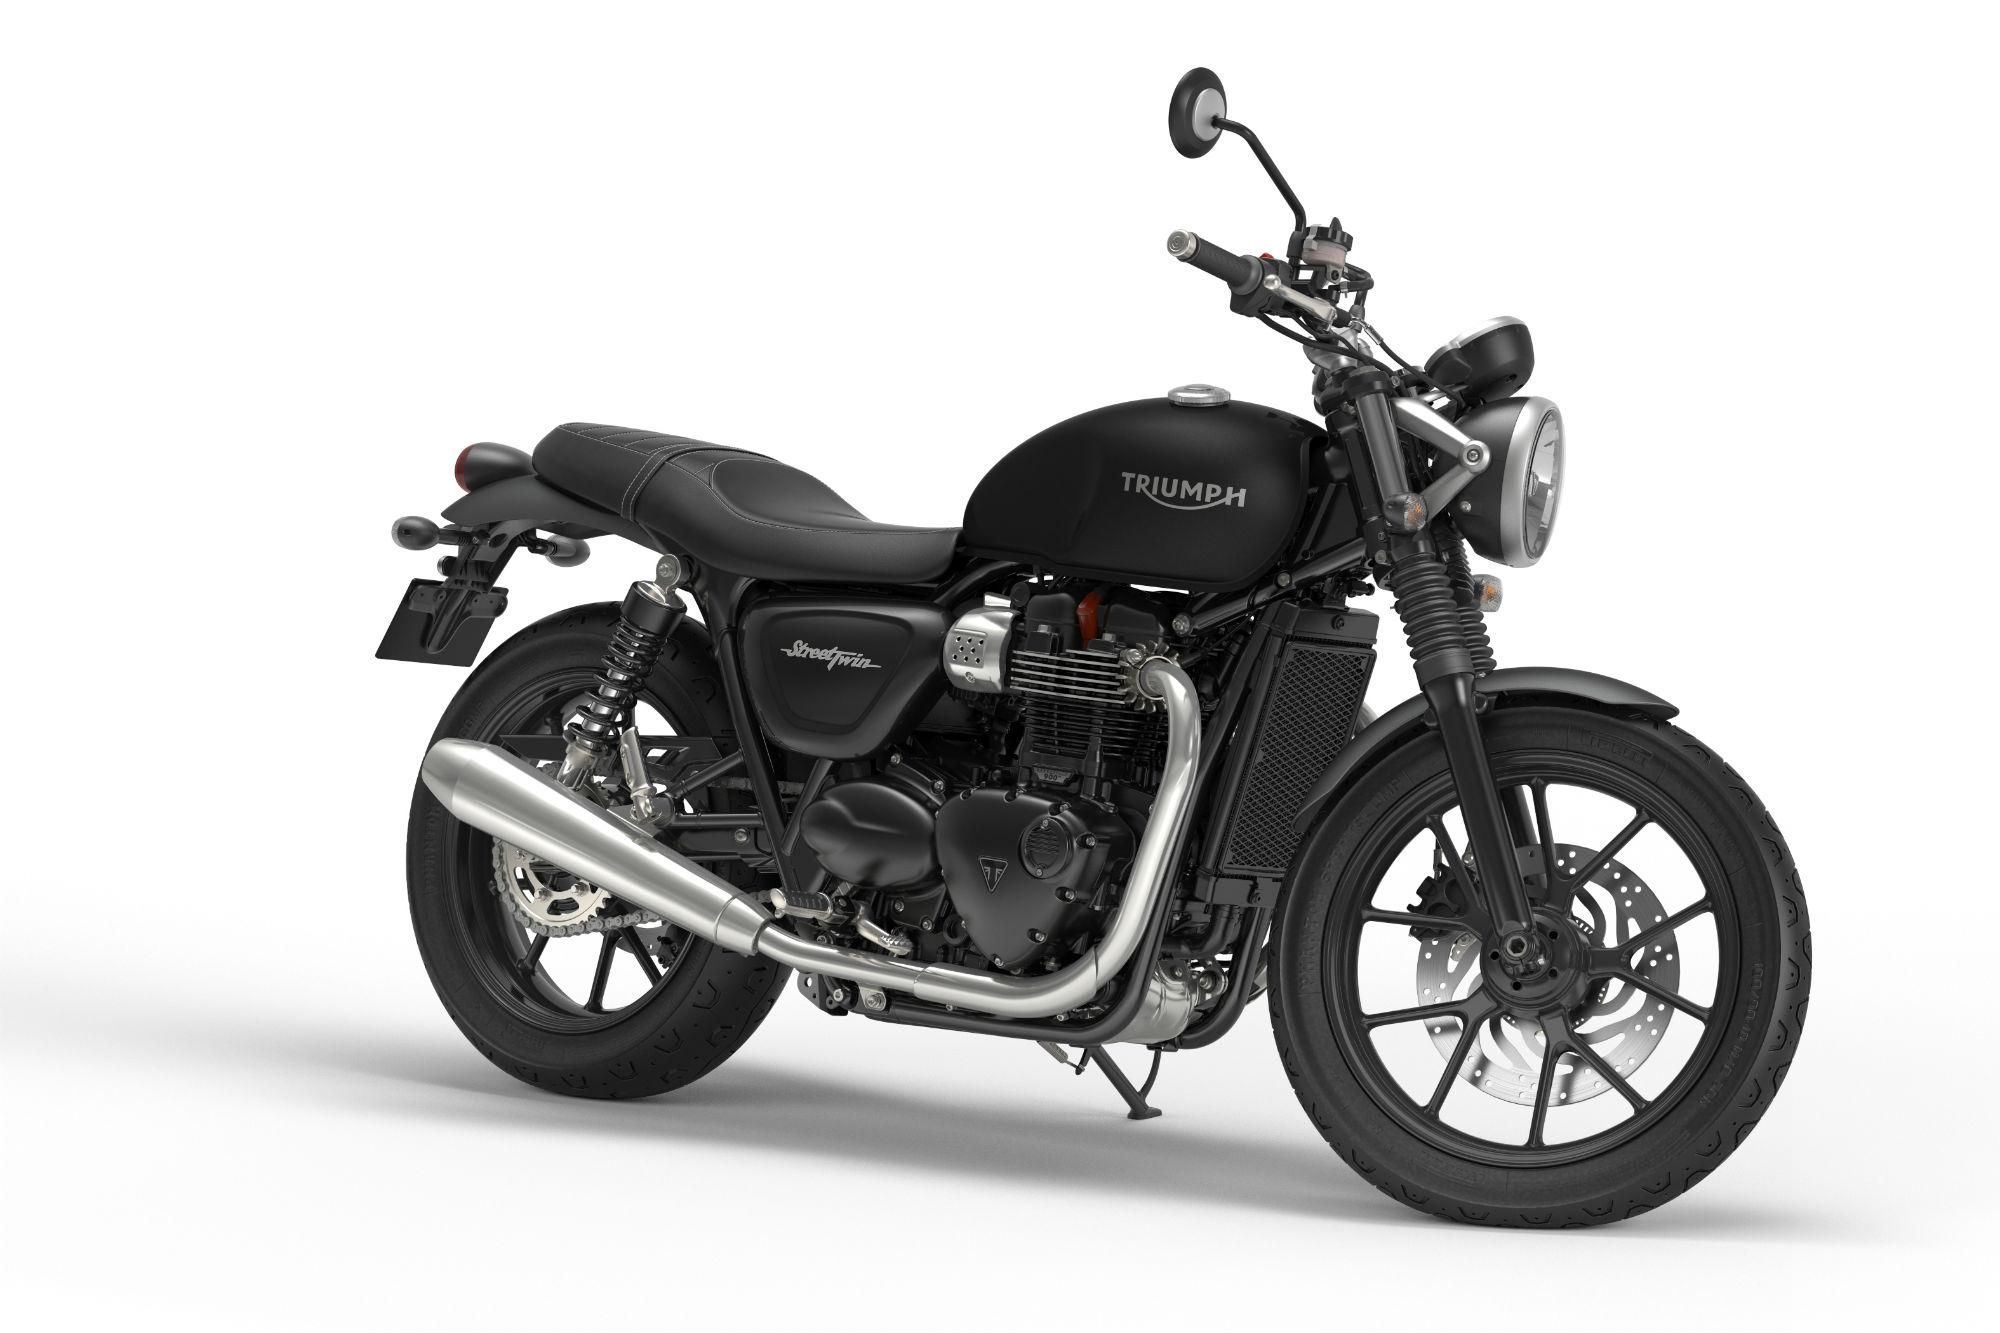 Triumph Bonneville pricing and specs revealed